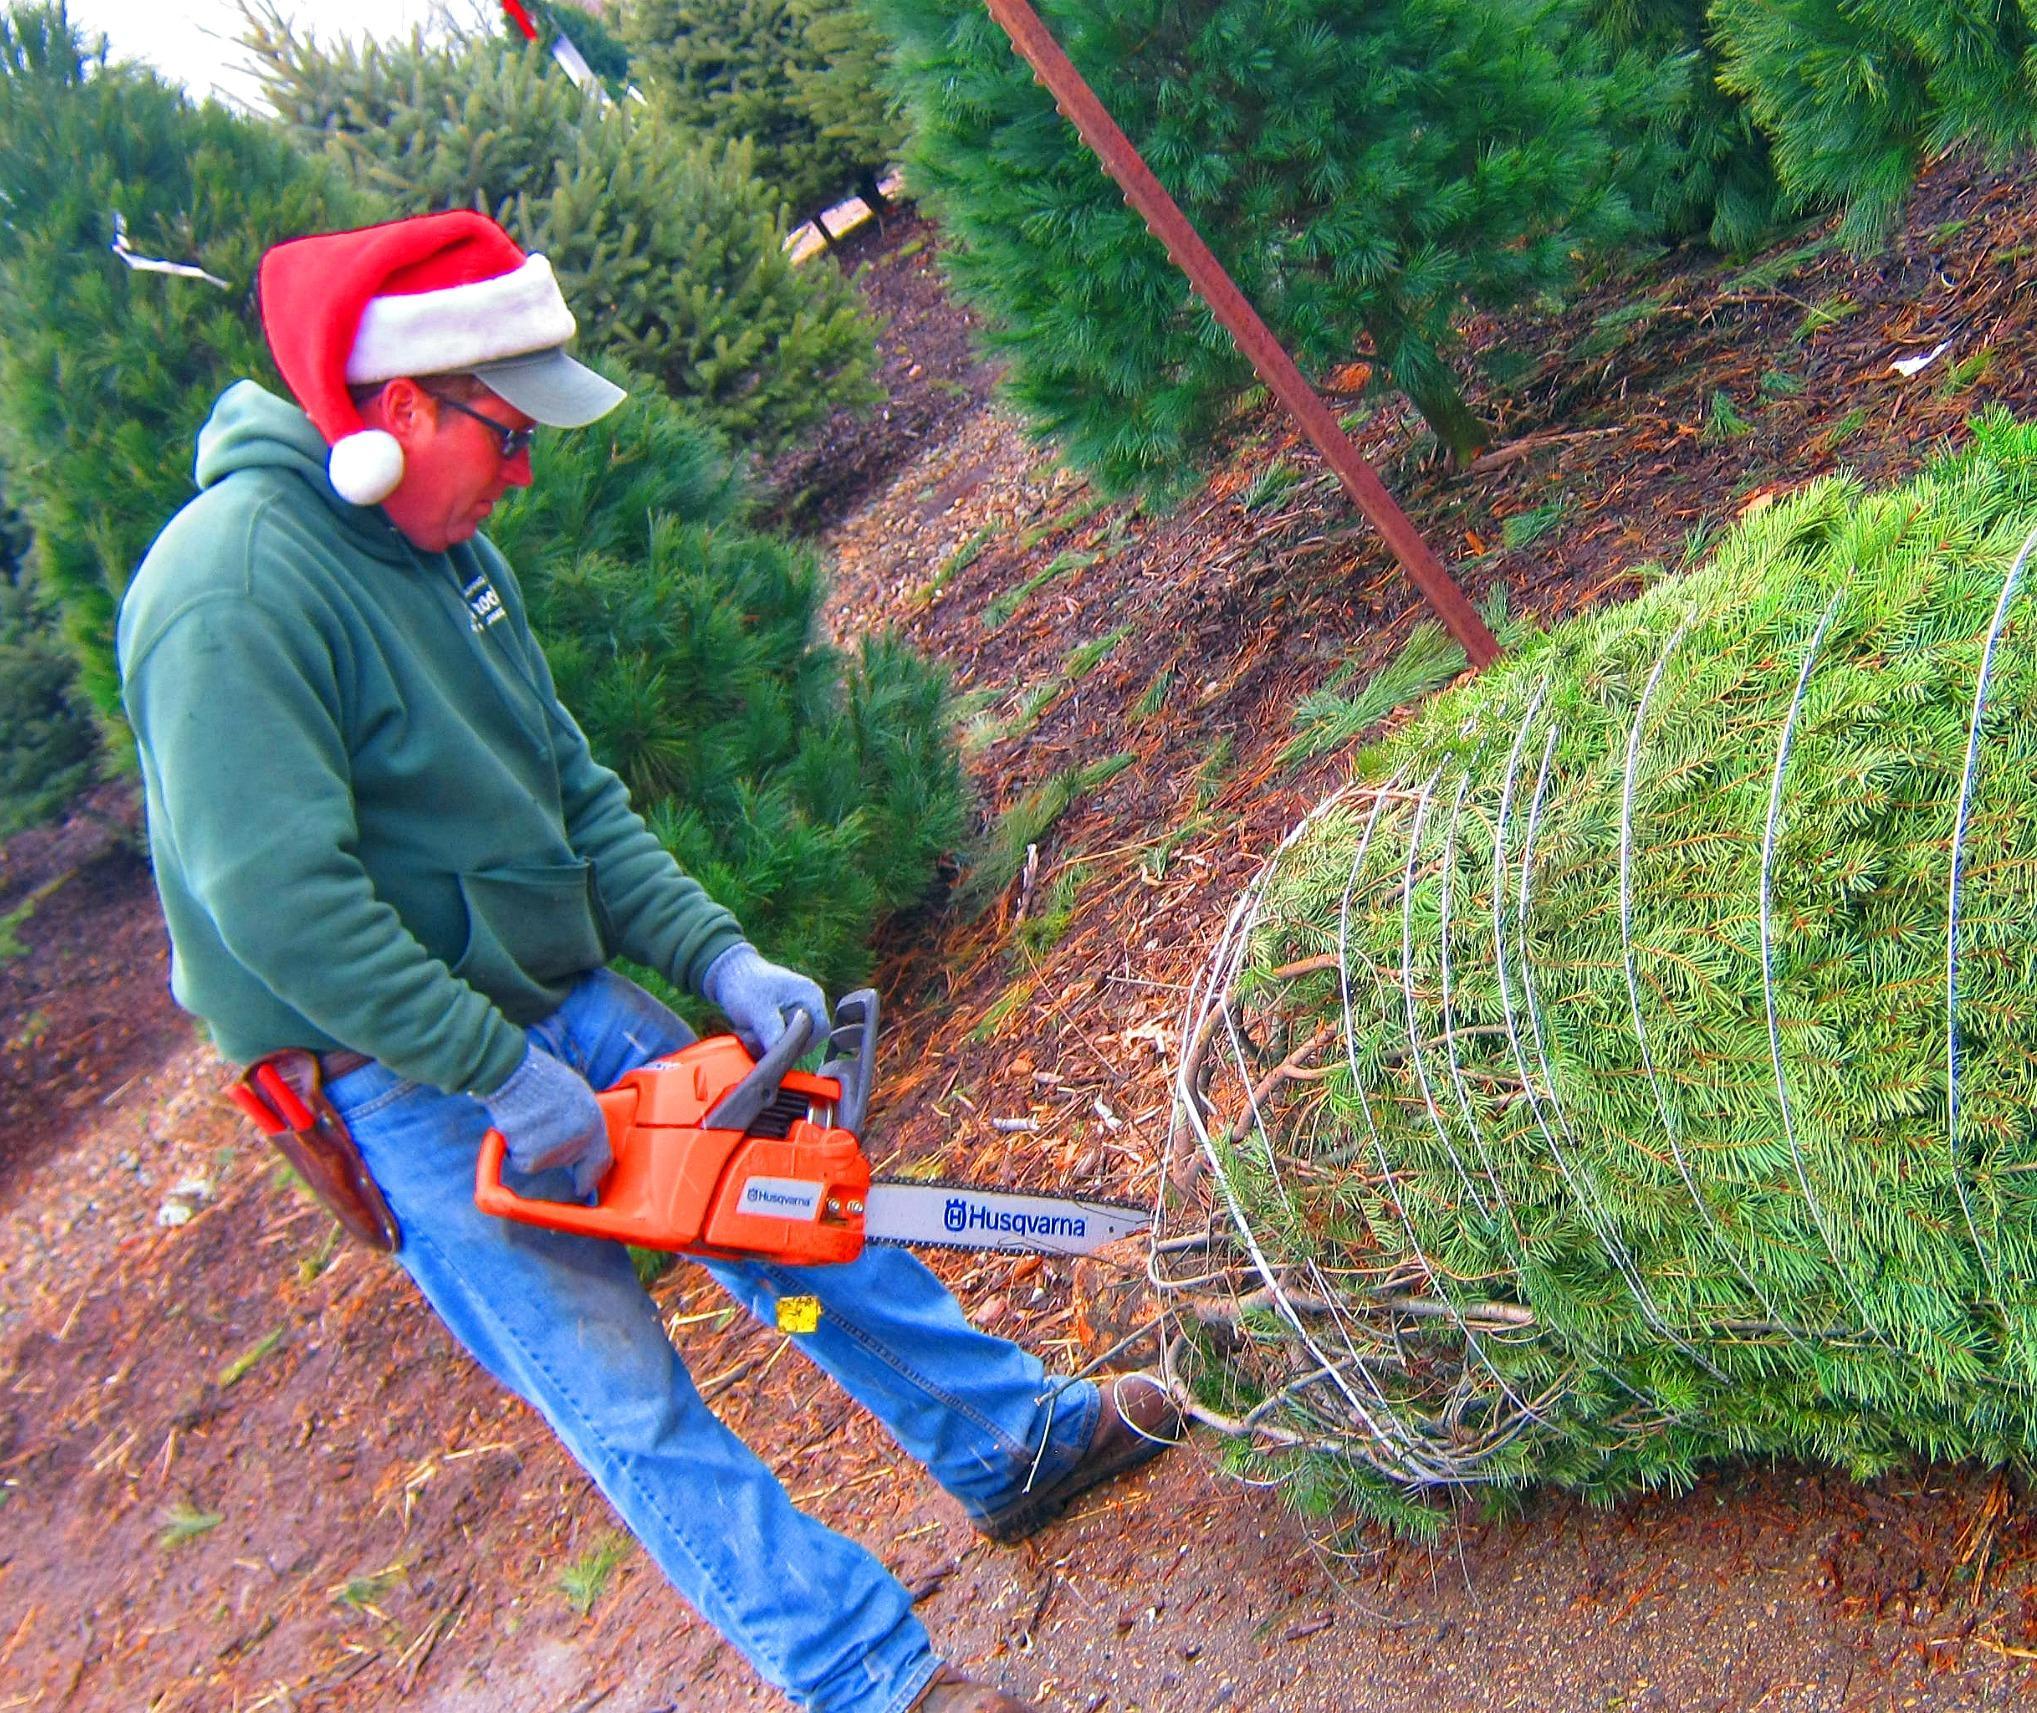 matt horrocks saws the lower branches off a freshly cut christmas tree his grandfather got horrocks nursery into the christmas tree business in 1937 - Christmas Tree Nursery